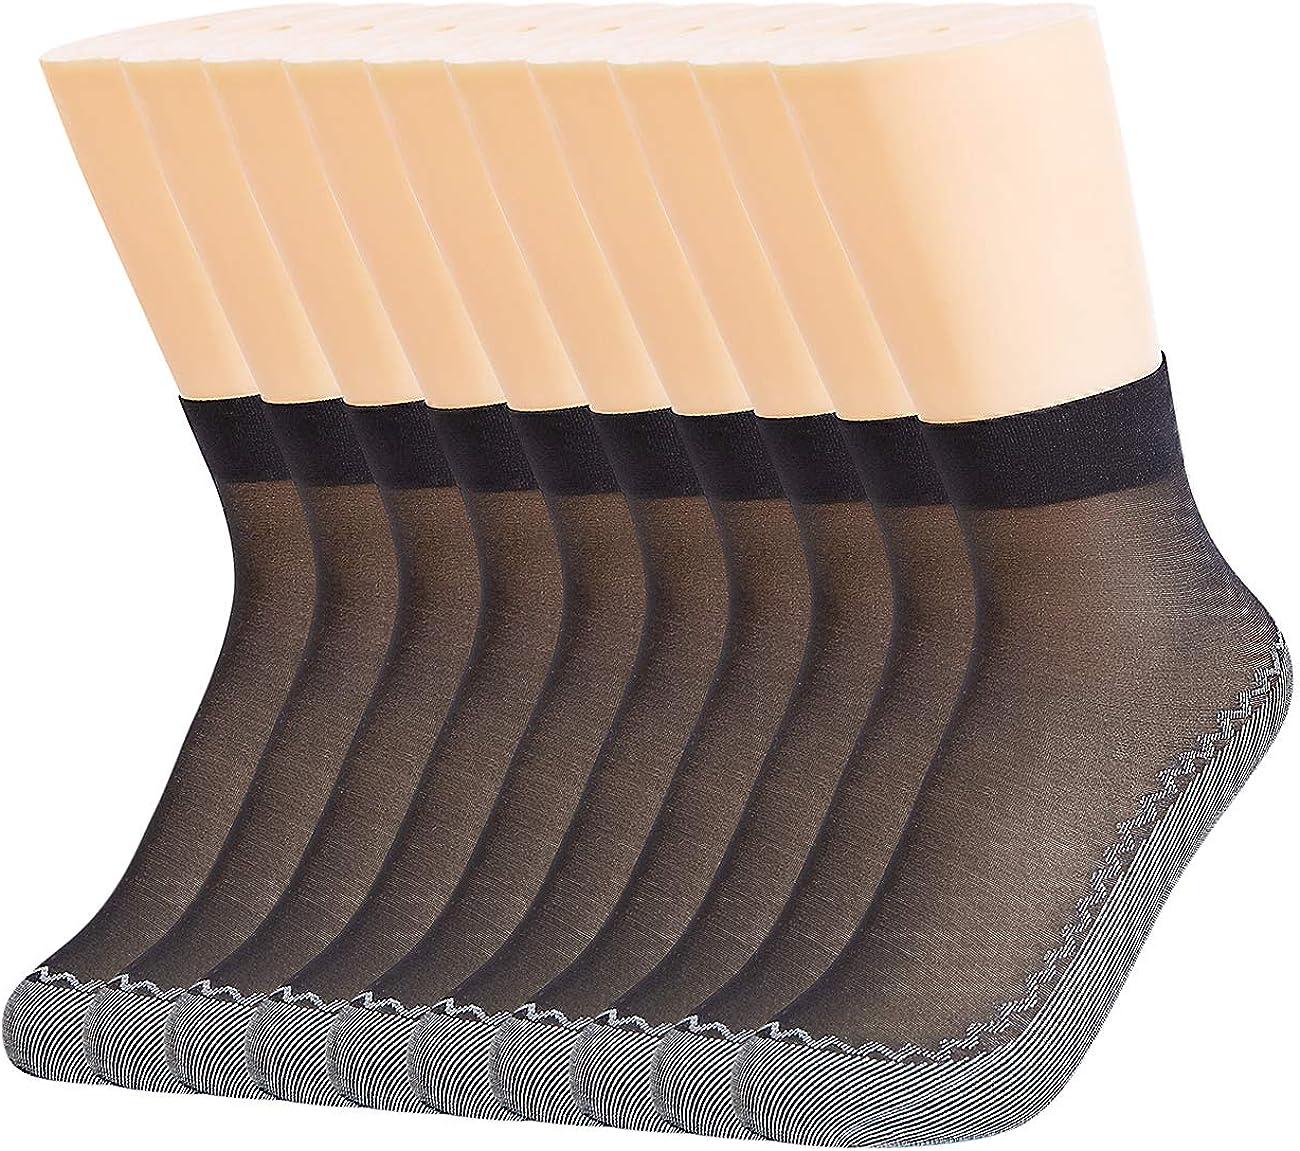 Azeho Women's Sheer Socks 12 Pairs Ankle High Crystal Silky Short Stockings Hosiery Everyday Reinforced Toe